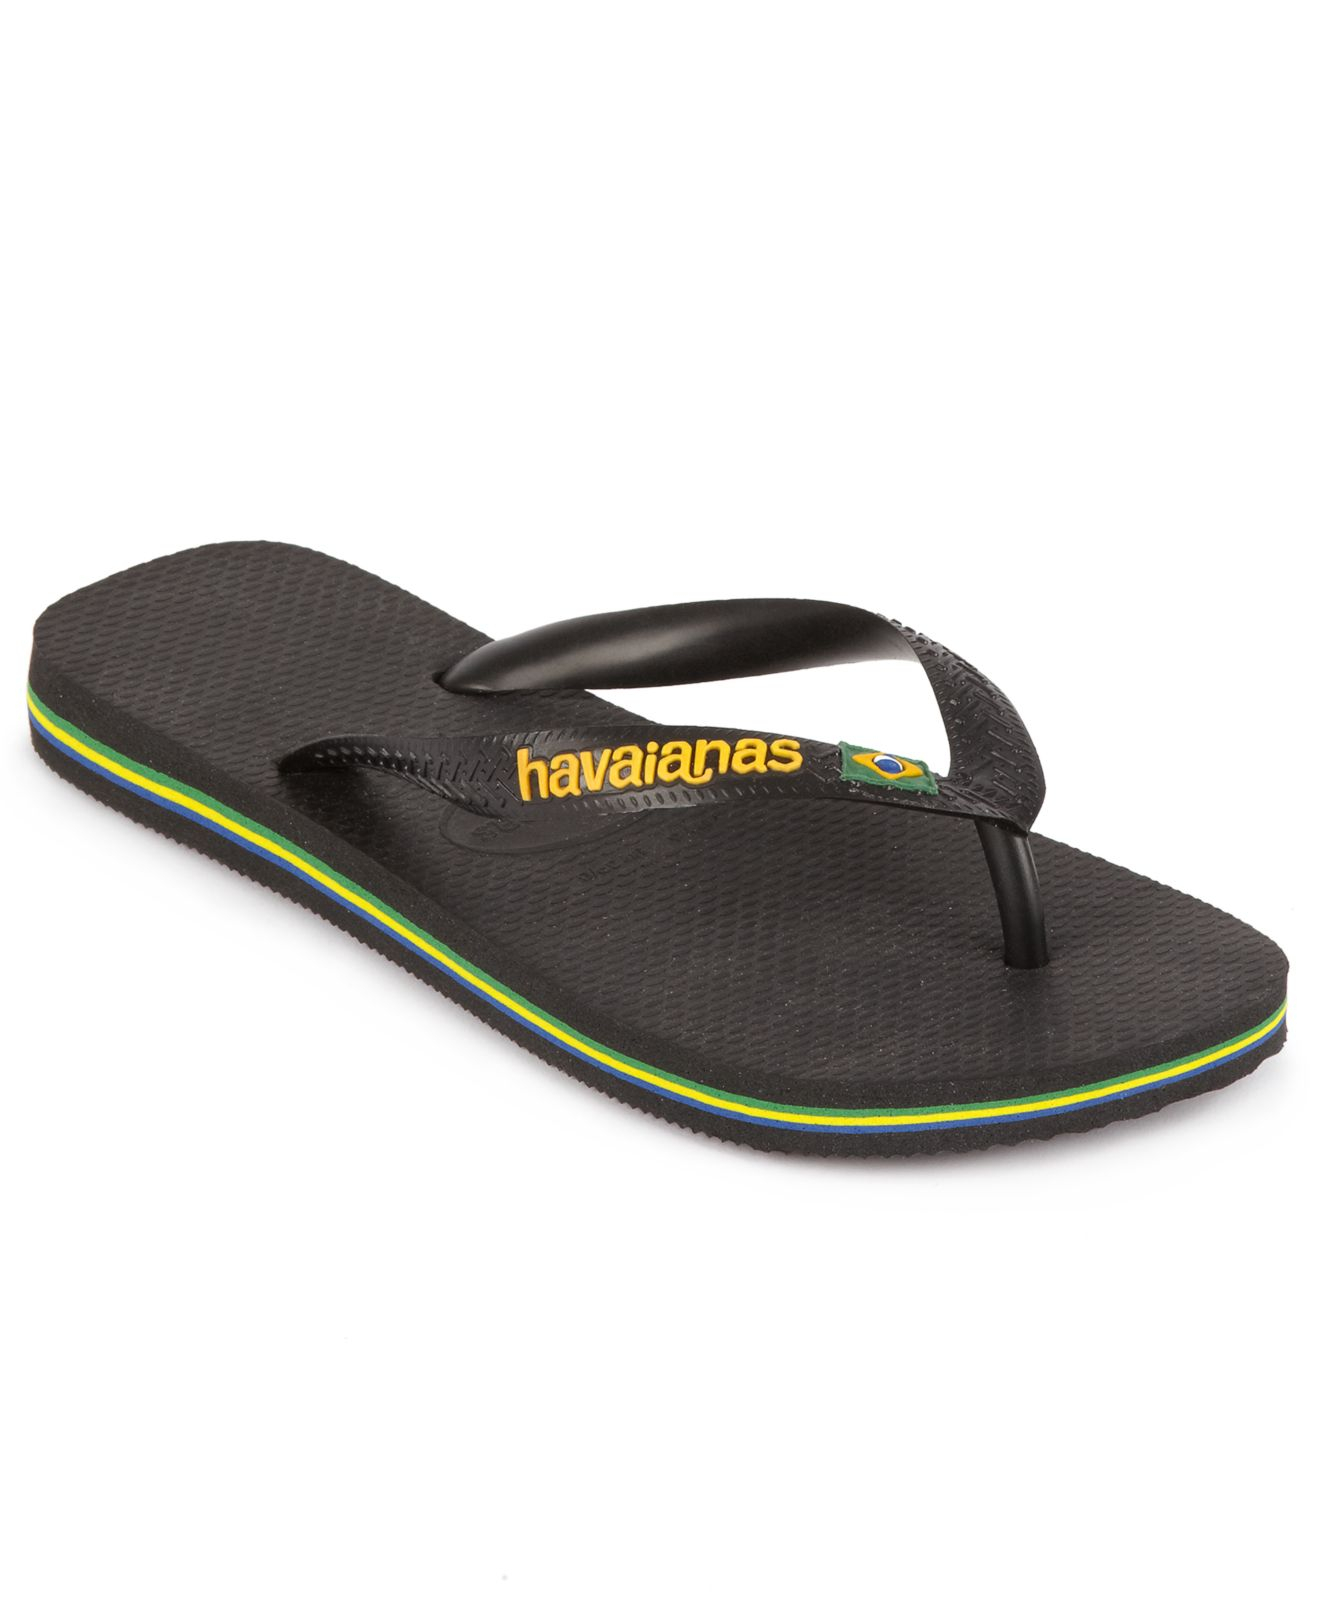 44a2c9aa700d Lyst - Havaianas Brazil Logo Flip Flop Sandals in Black for Men